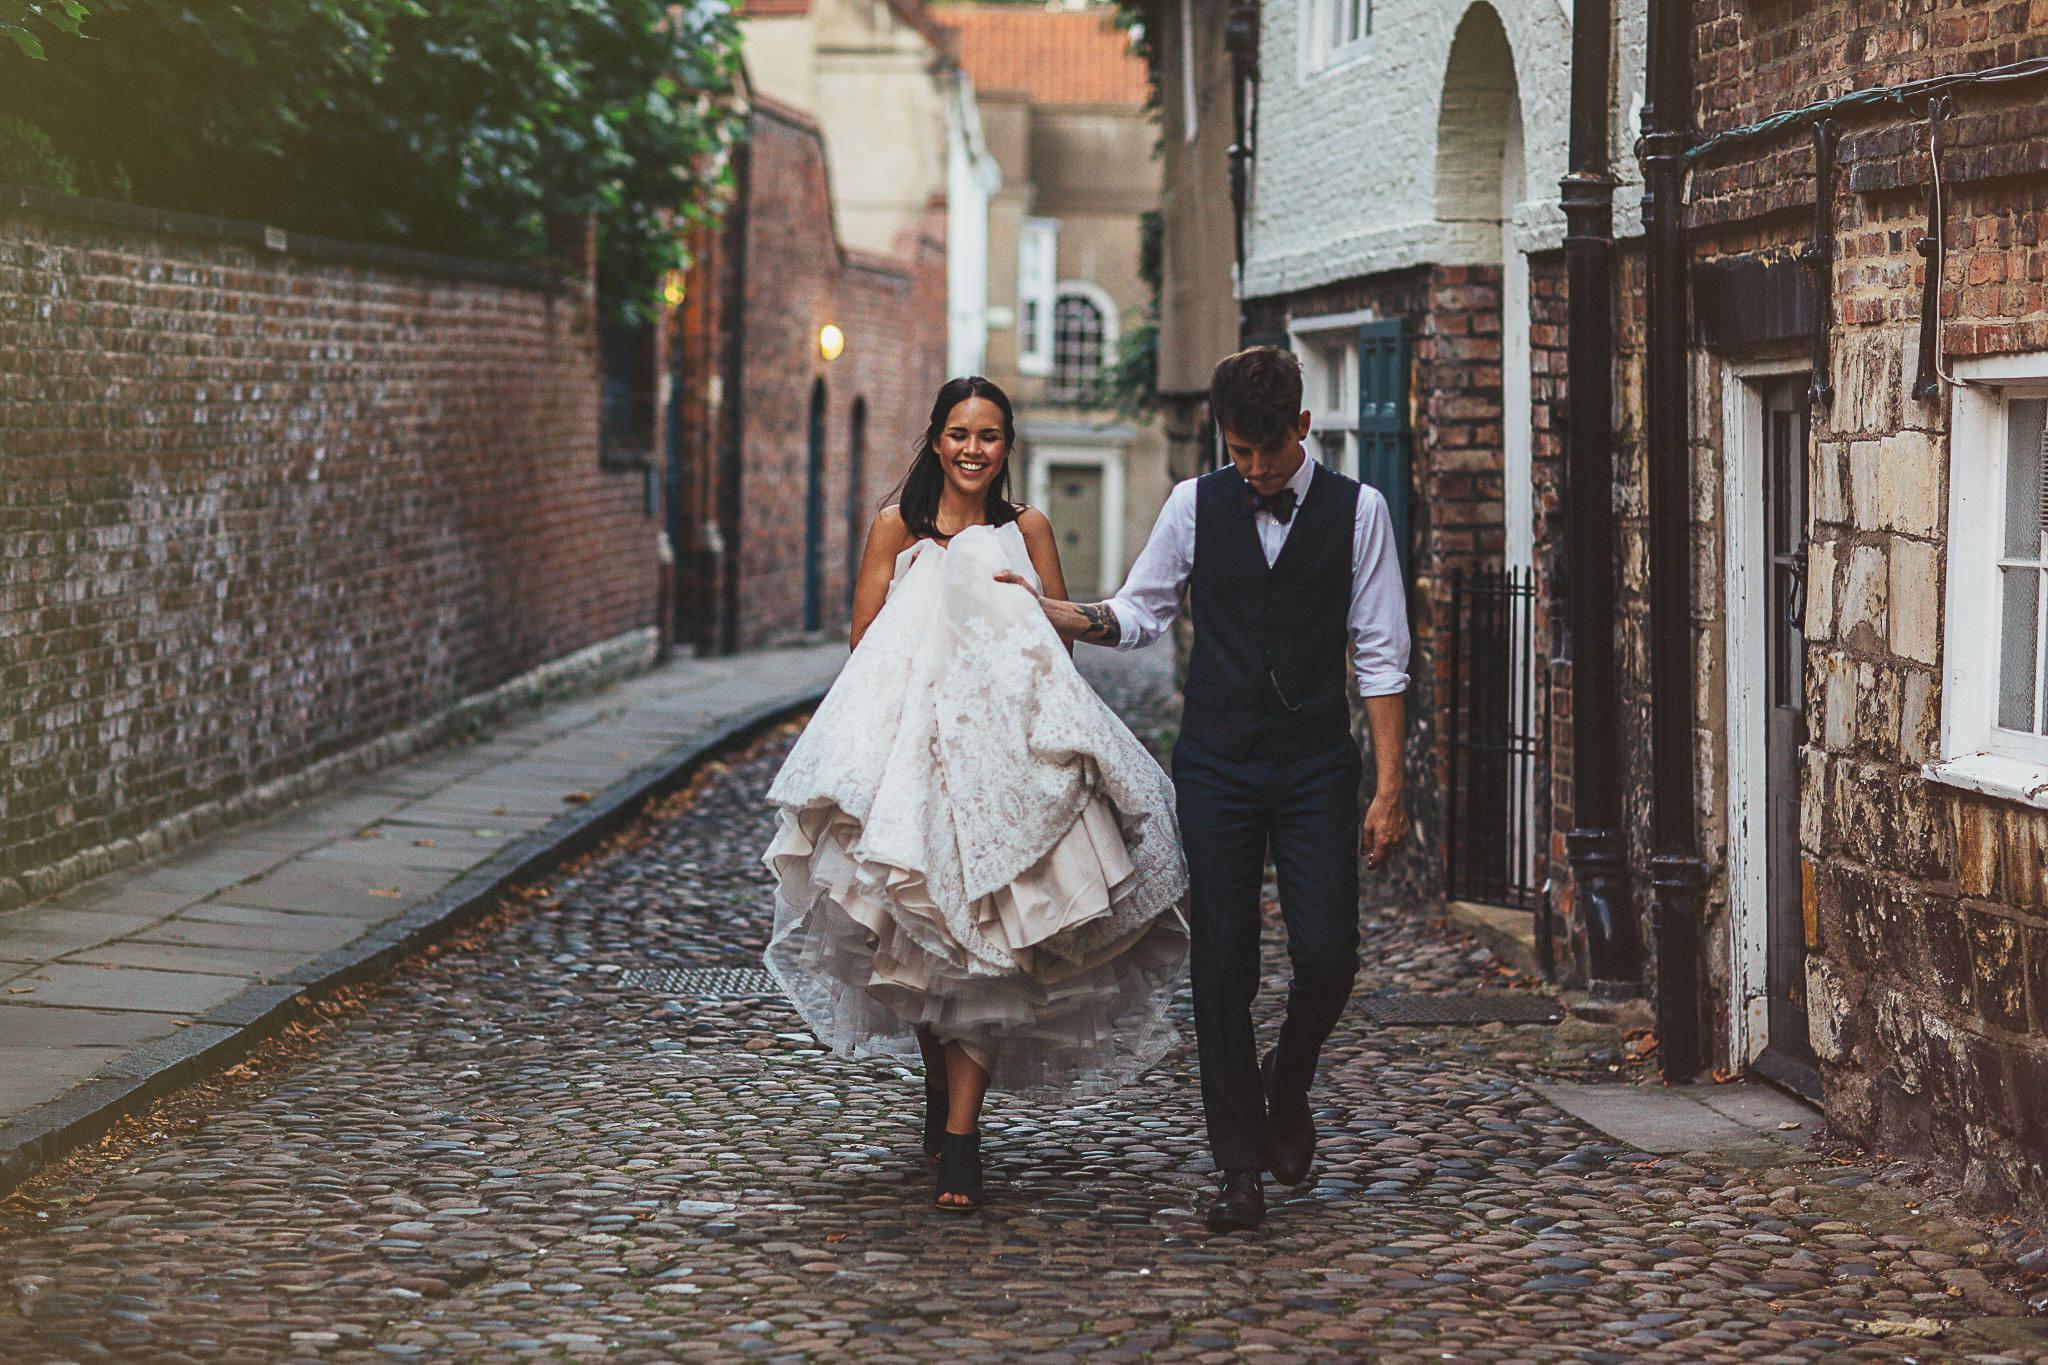 York-wedding-photography-grays-court-hotel-90407